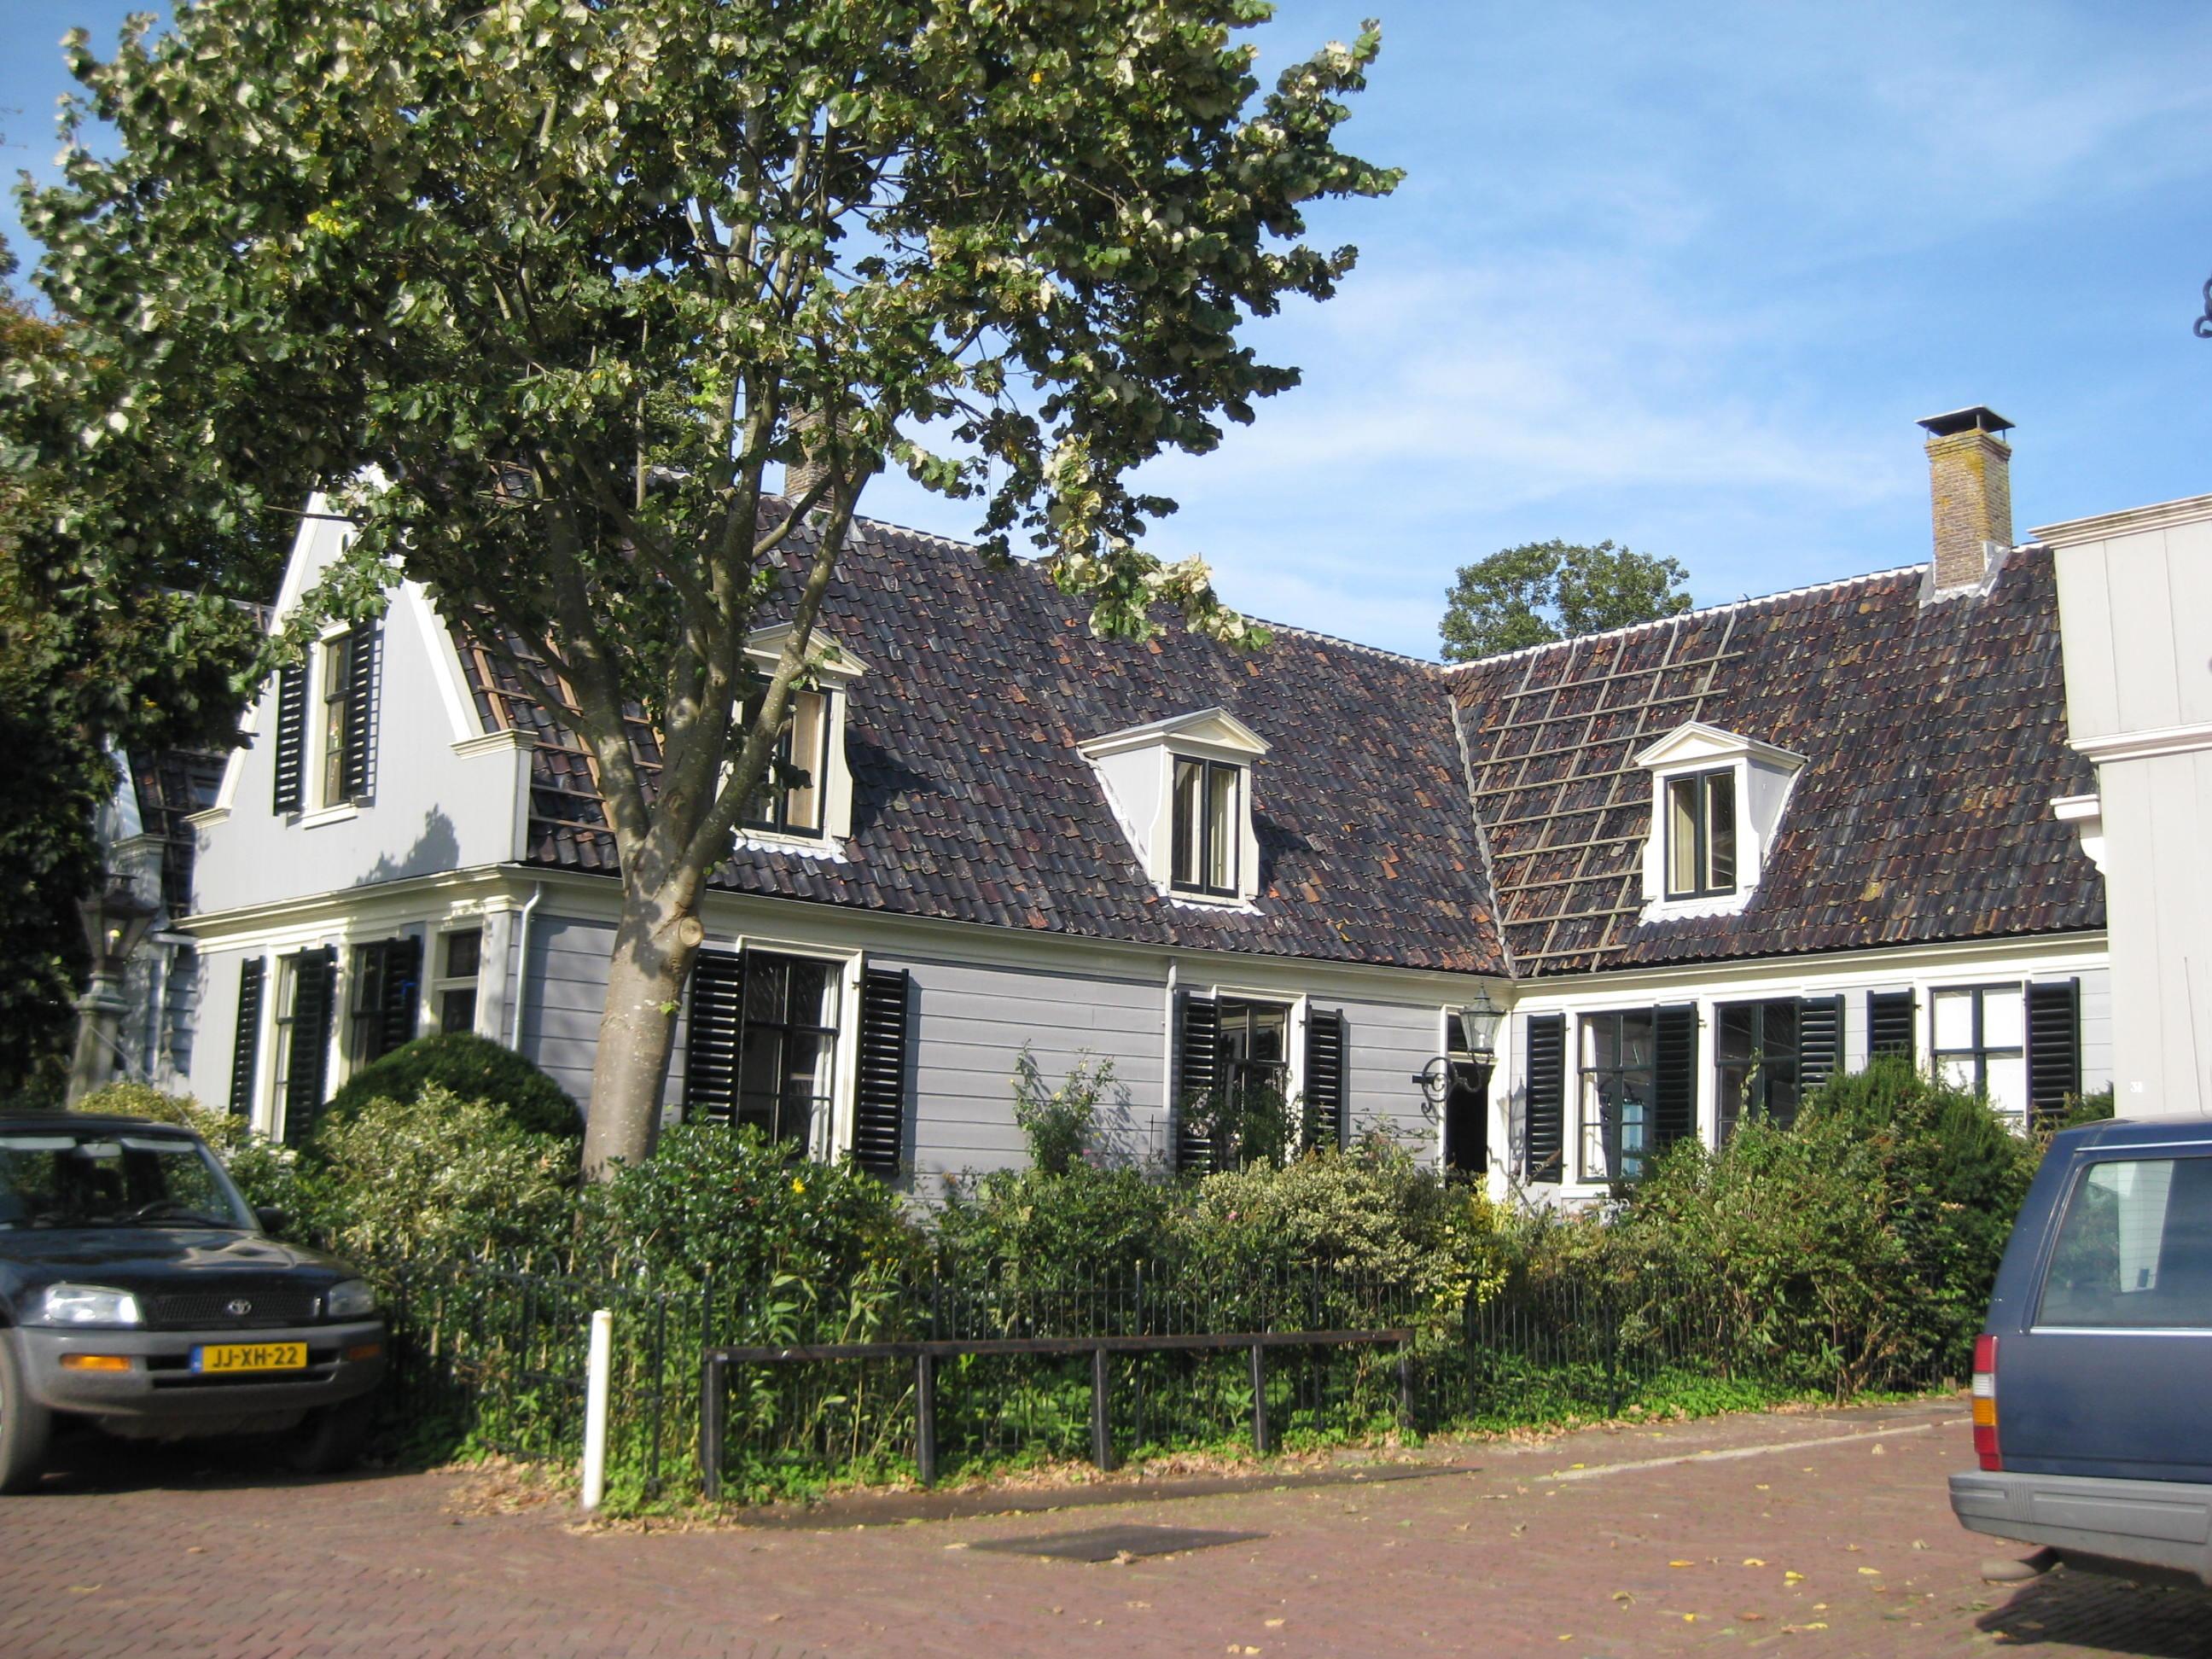 Houten huis in l vorm in broek in waterland monument - Foto huis in l ...